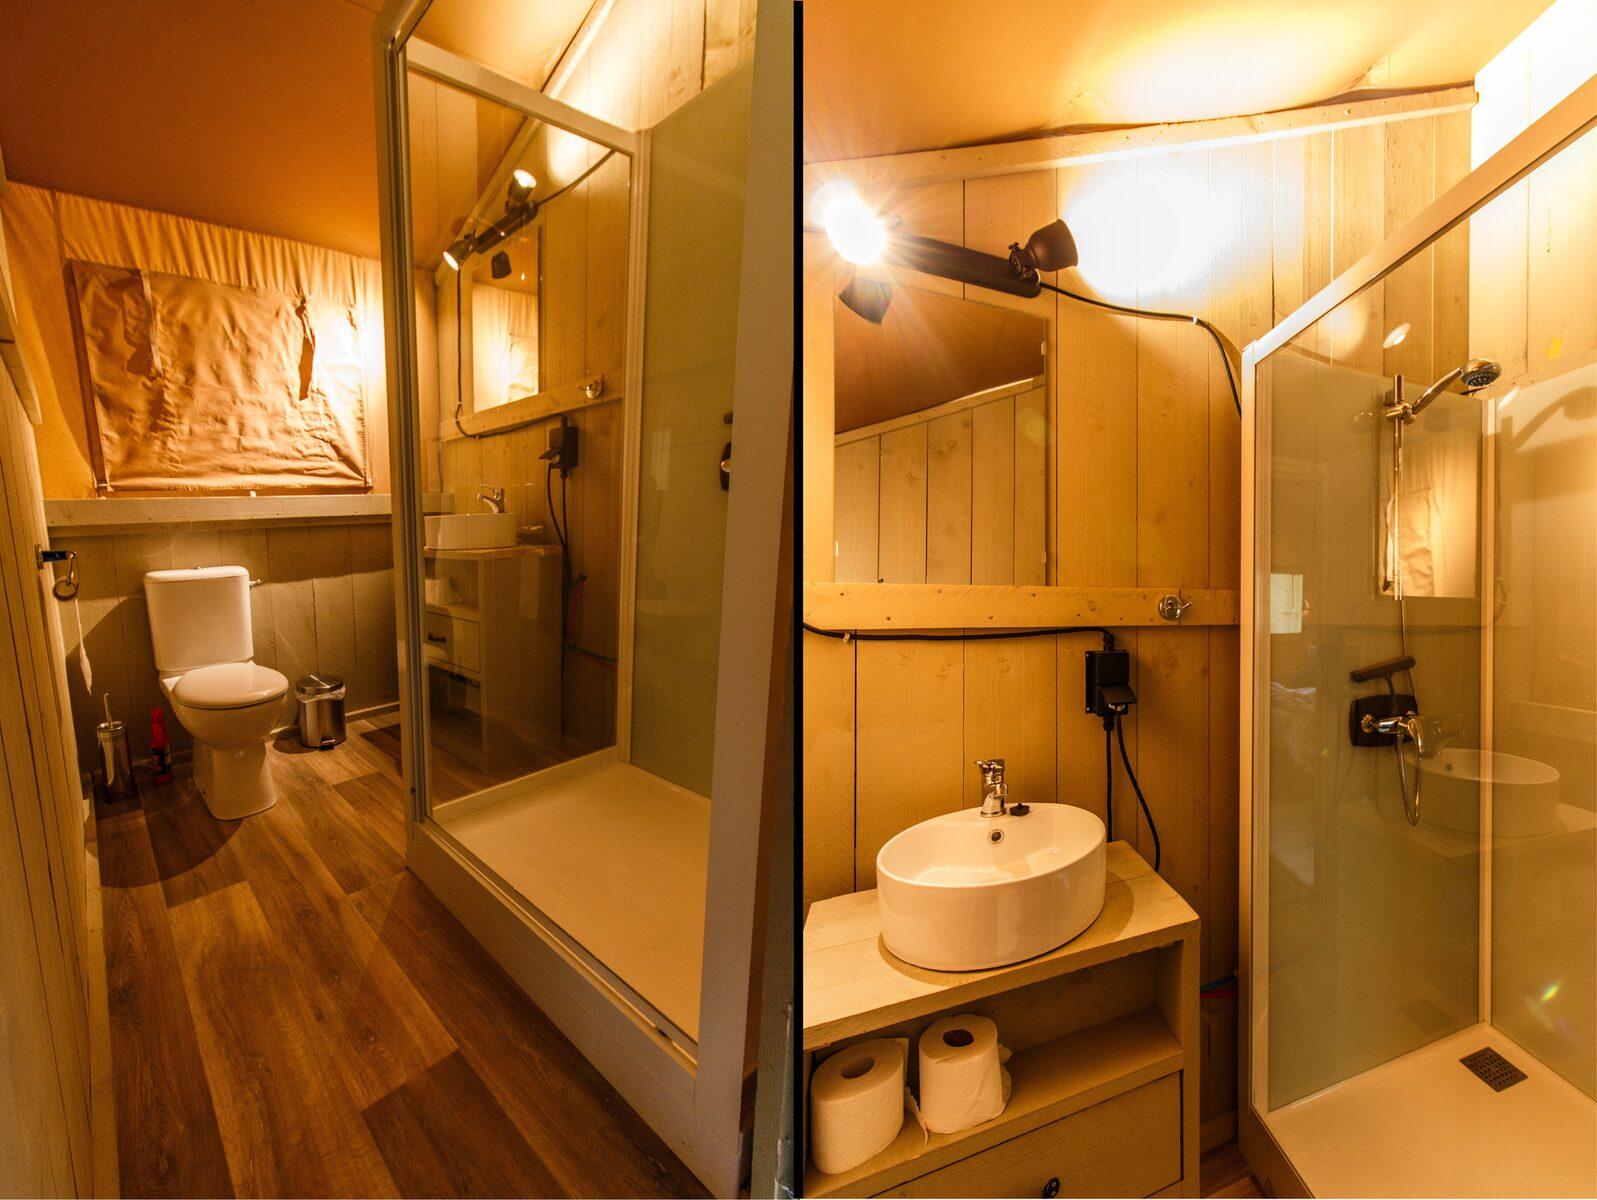 Safaritent 6 persoons met badkamer